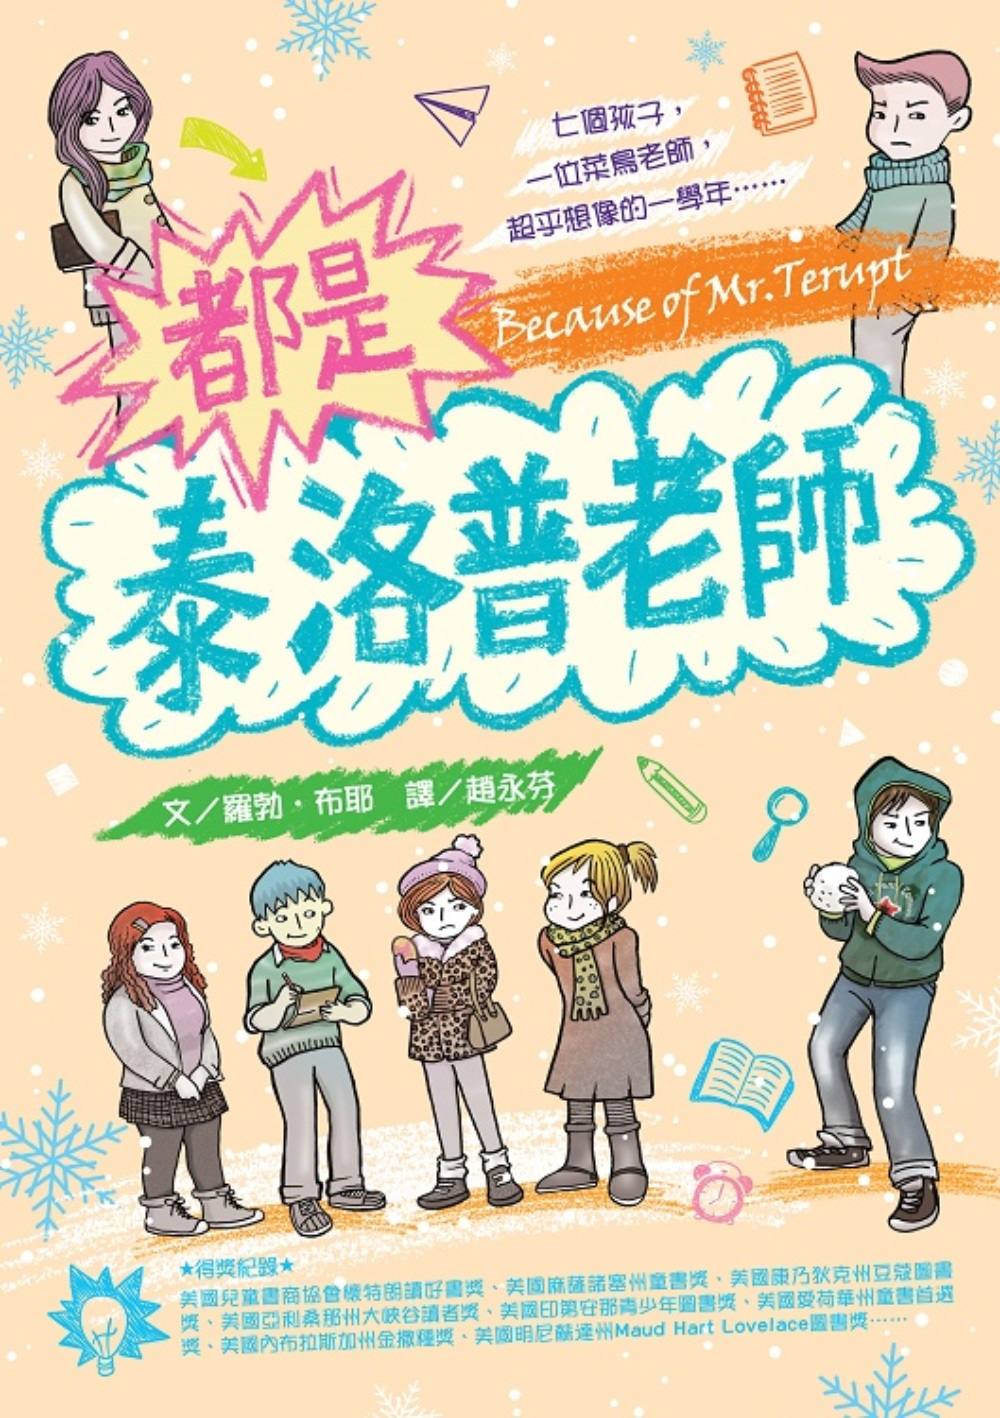 都是泰洛普老師( Because of Mr.Terupt)封面圖